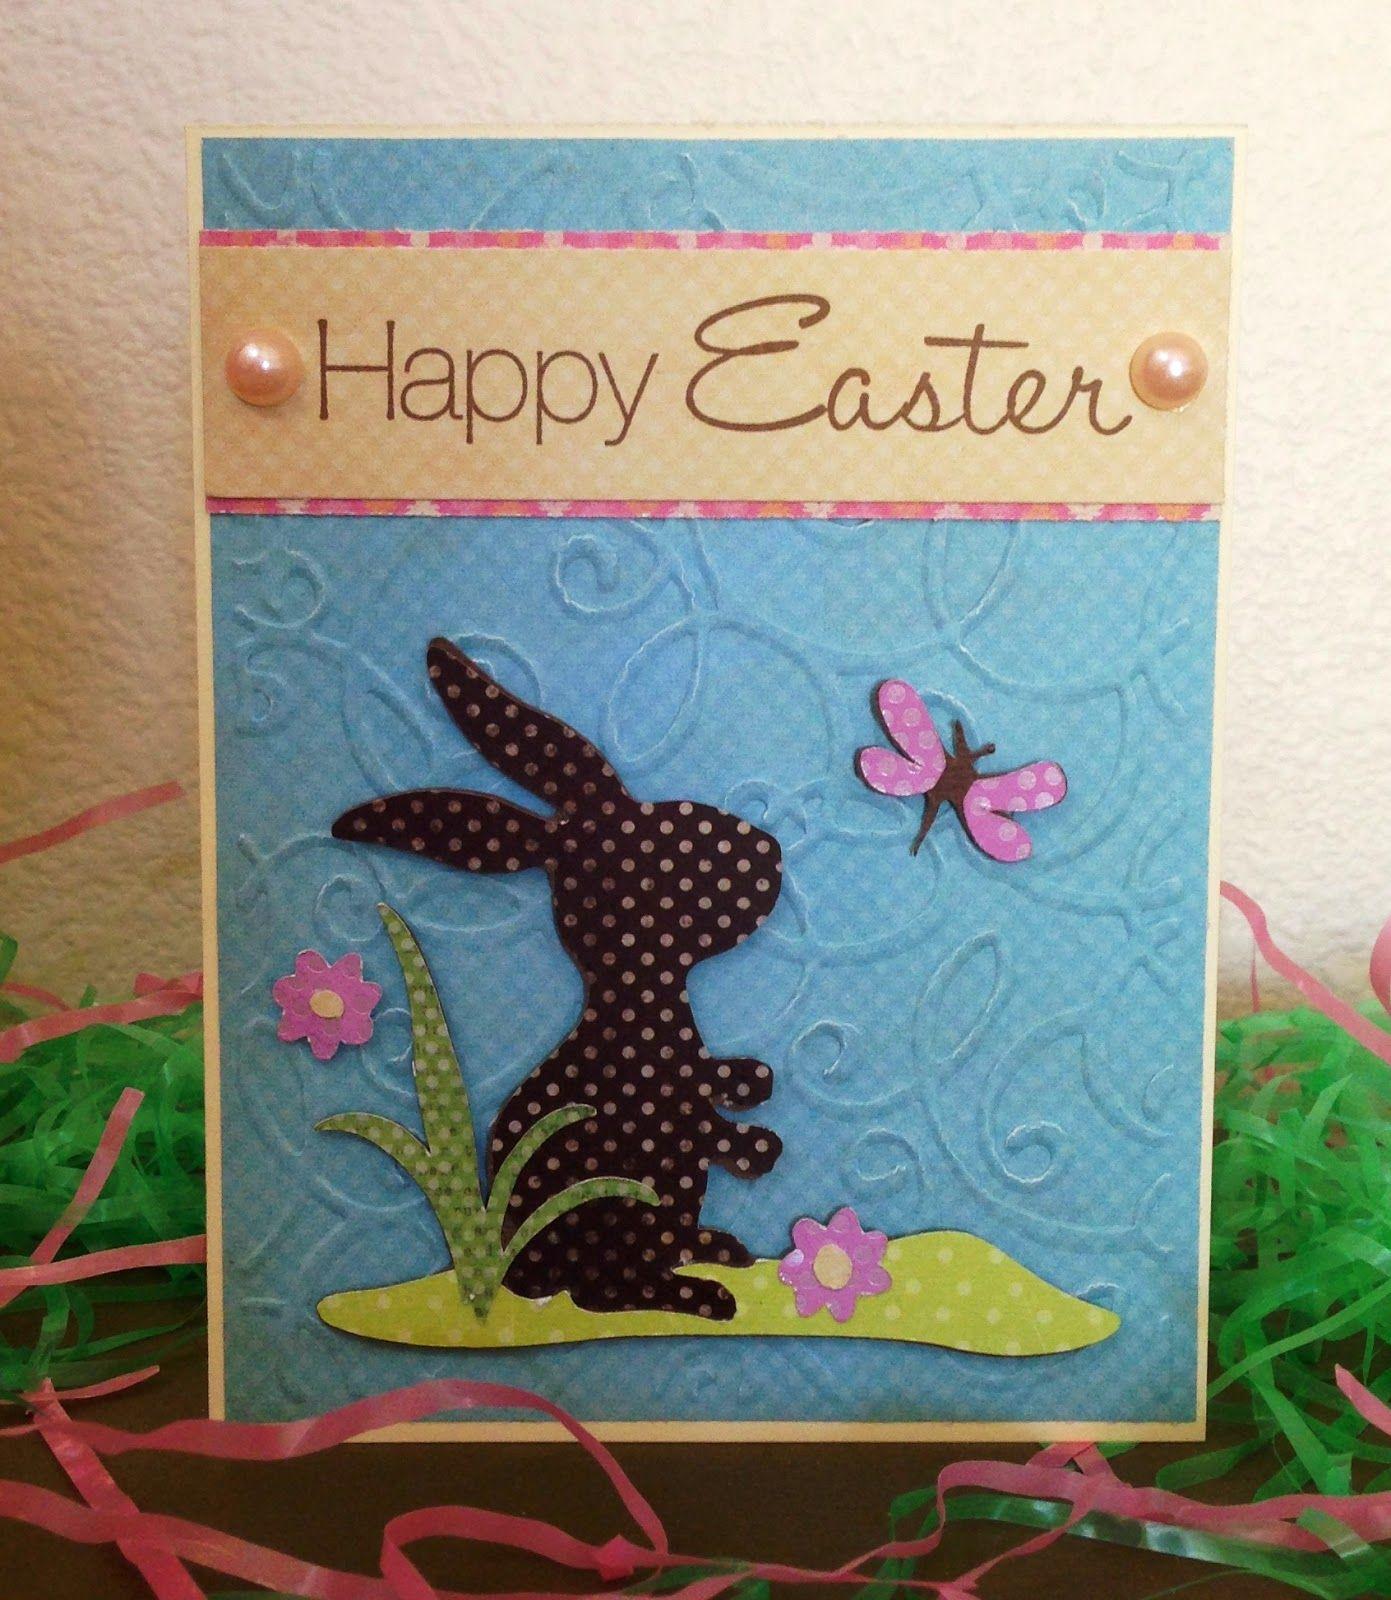 Mollie's Motif: BBTB2 - Happy Easter (Bunny) using Cricut Kate's ABC's